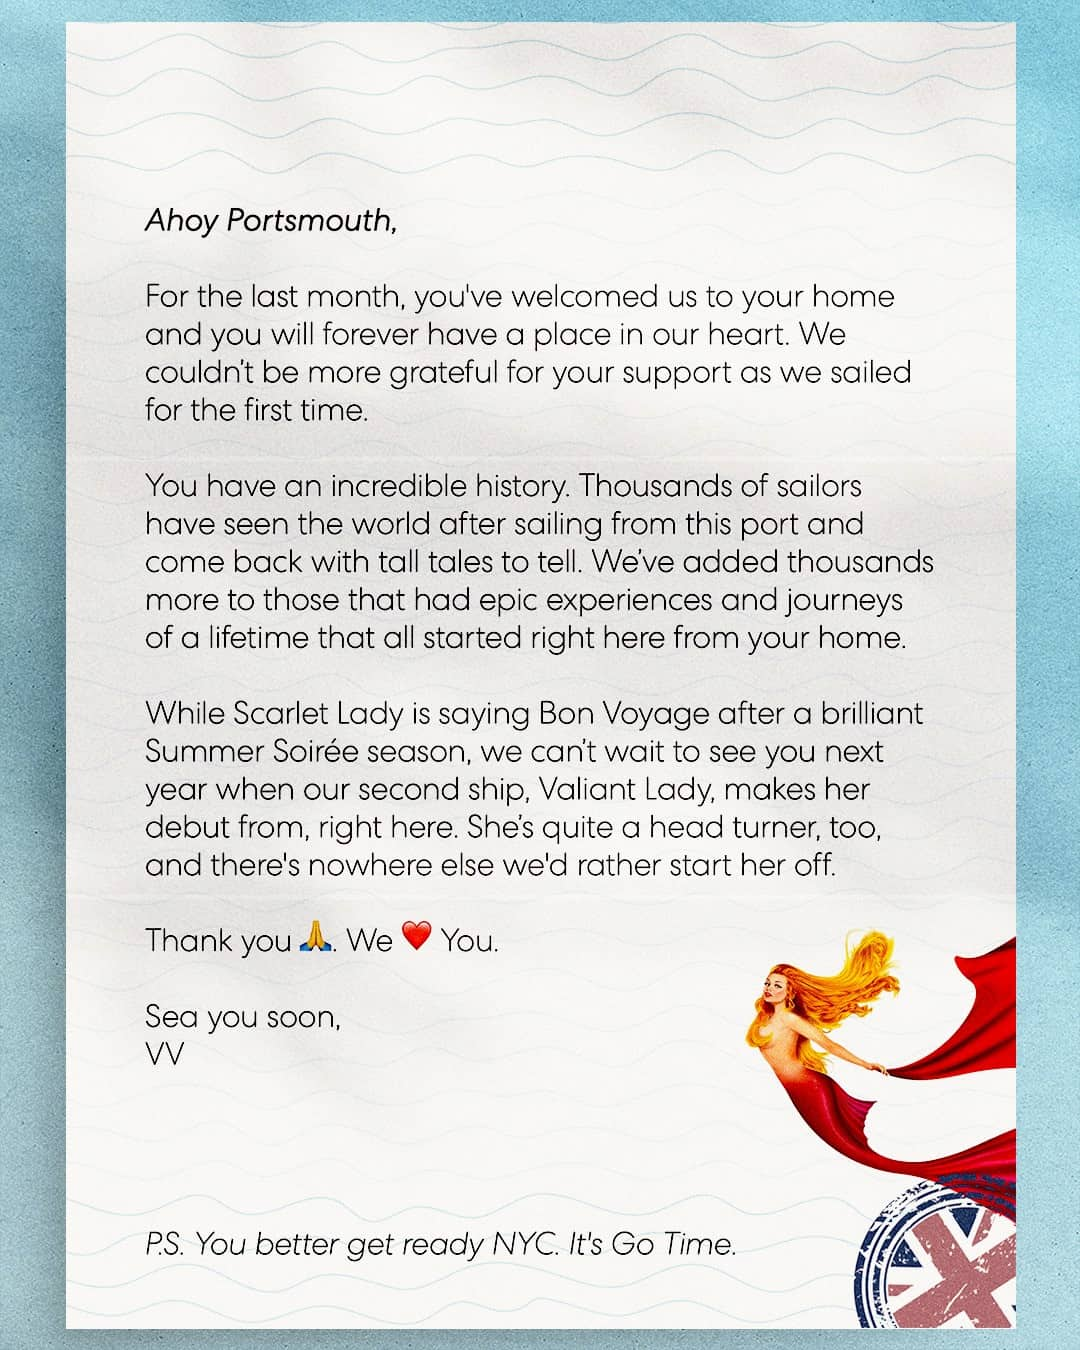 Virgin Voyages Letter to Portsmouth